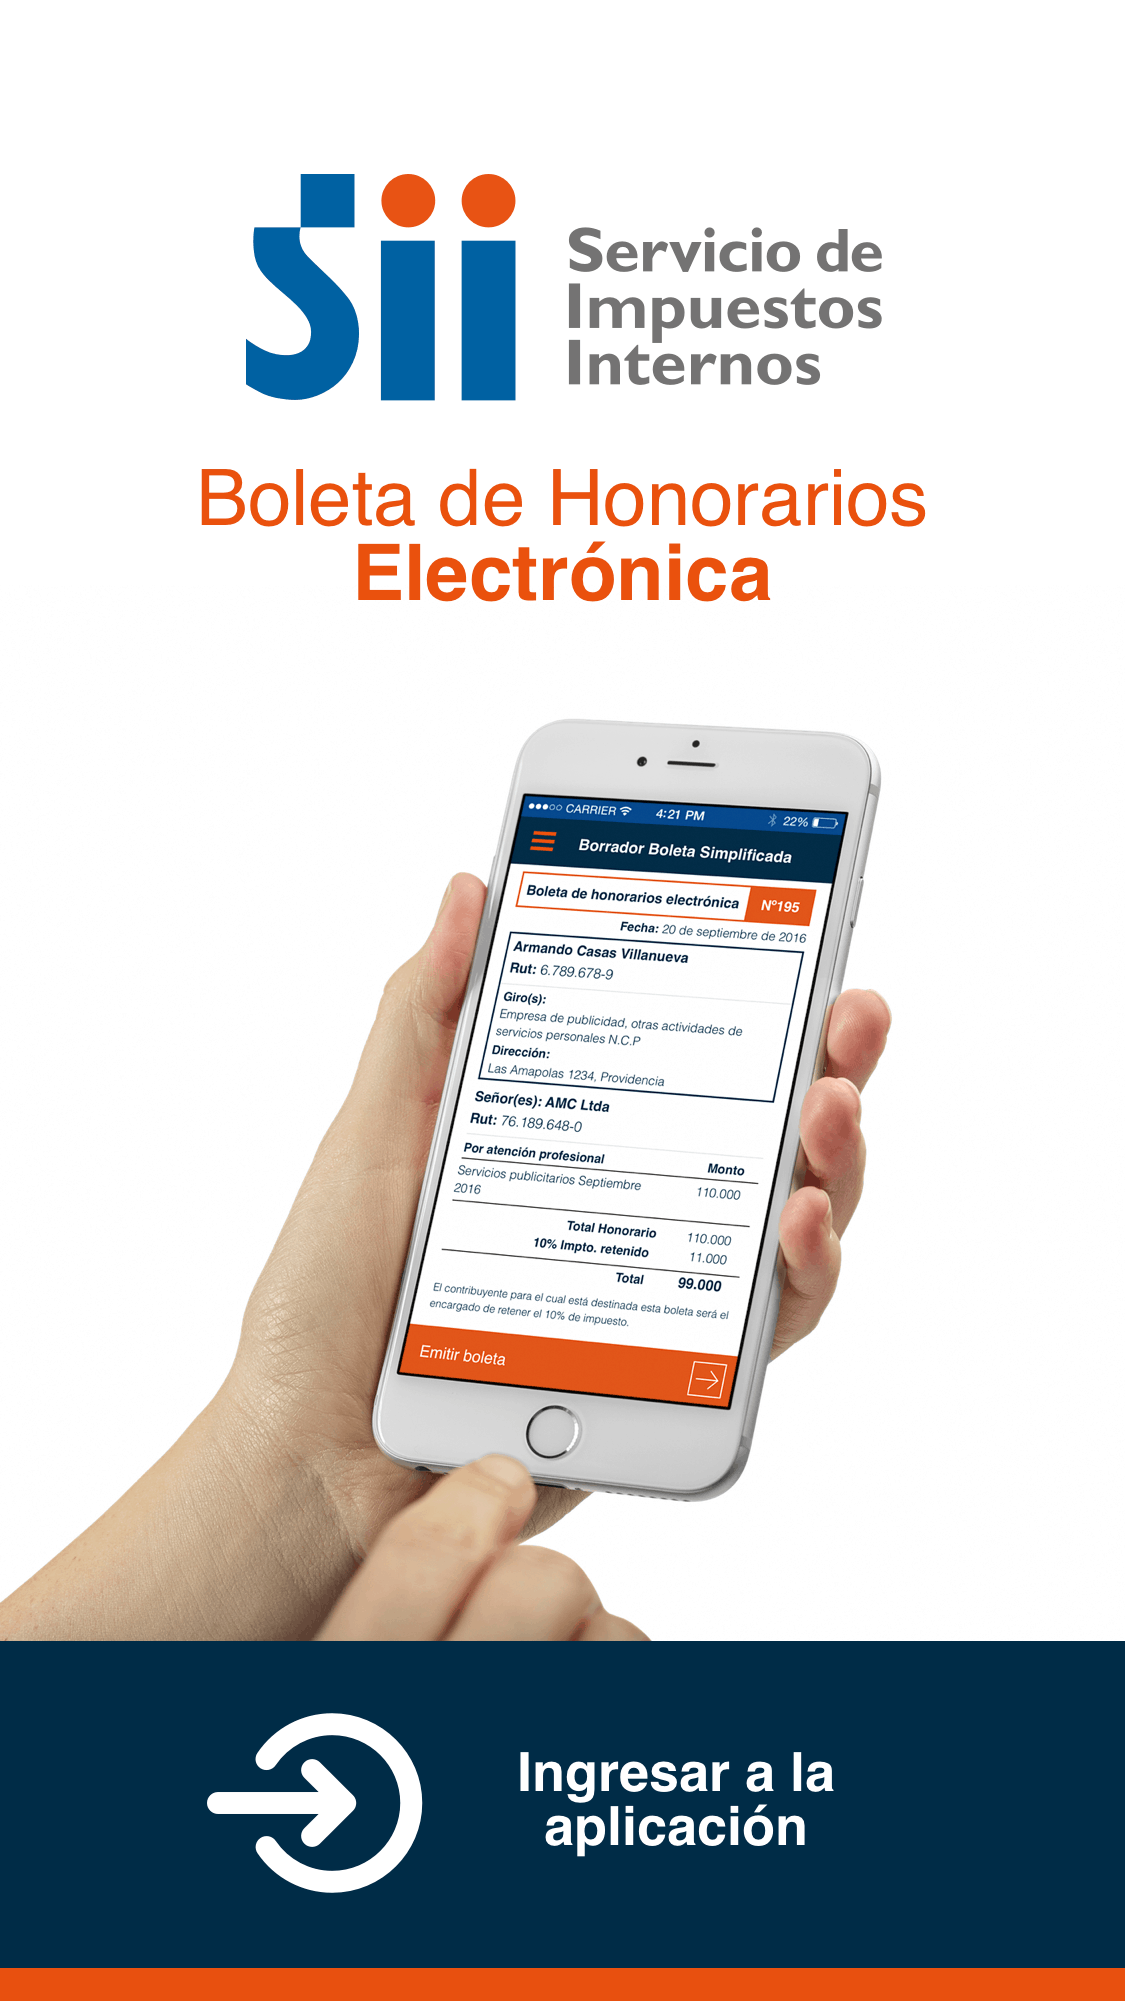 E-BOLETA: COMIENZA A EMITIR TUS BOLETAS DE HONORARIOS DESDE EL TELÉFONO MOVIL